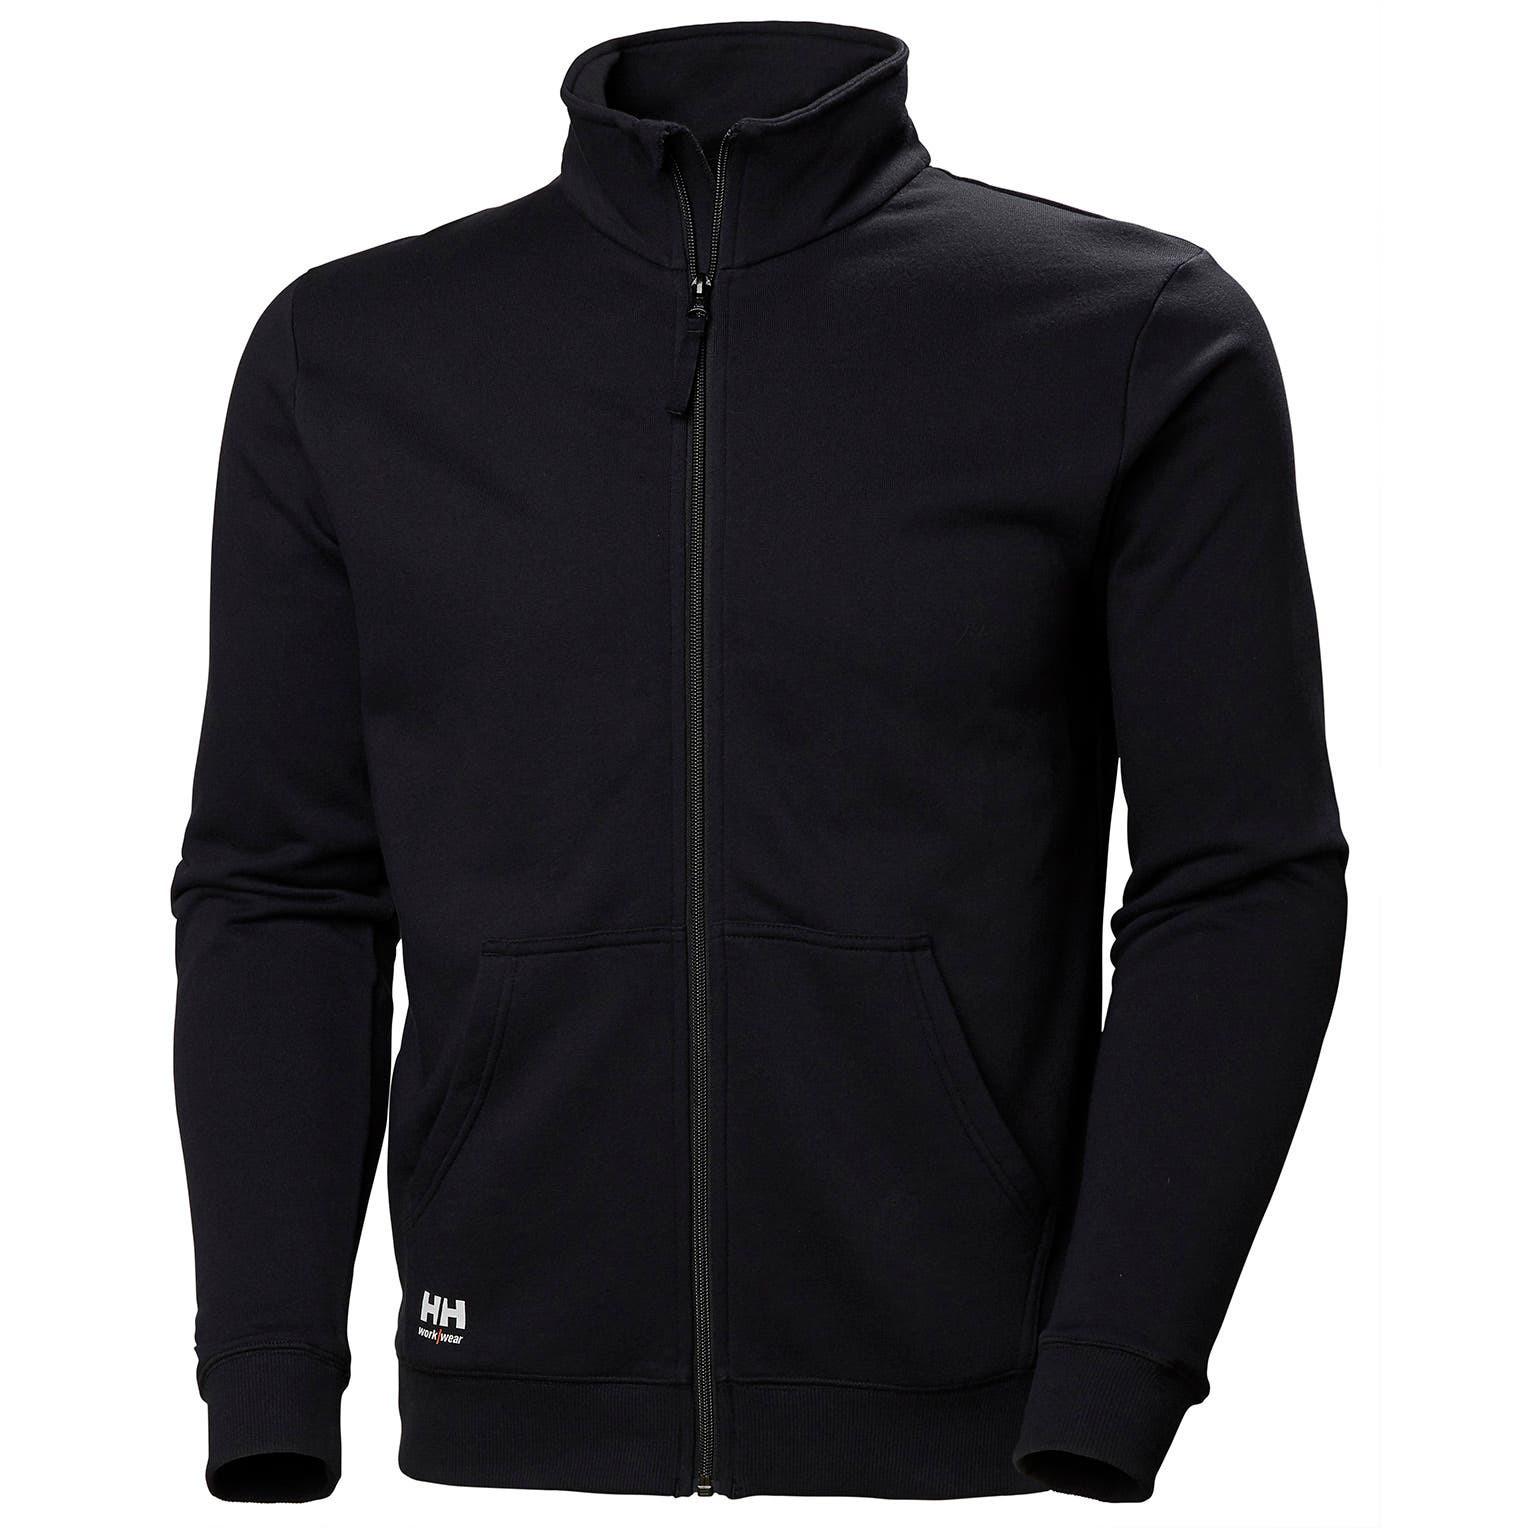 Свитшот на молнии Helly Hansen Manchester Zip Sweatshirt - 79212 (Black; L)